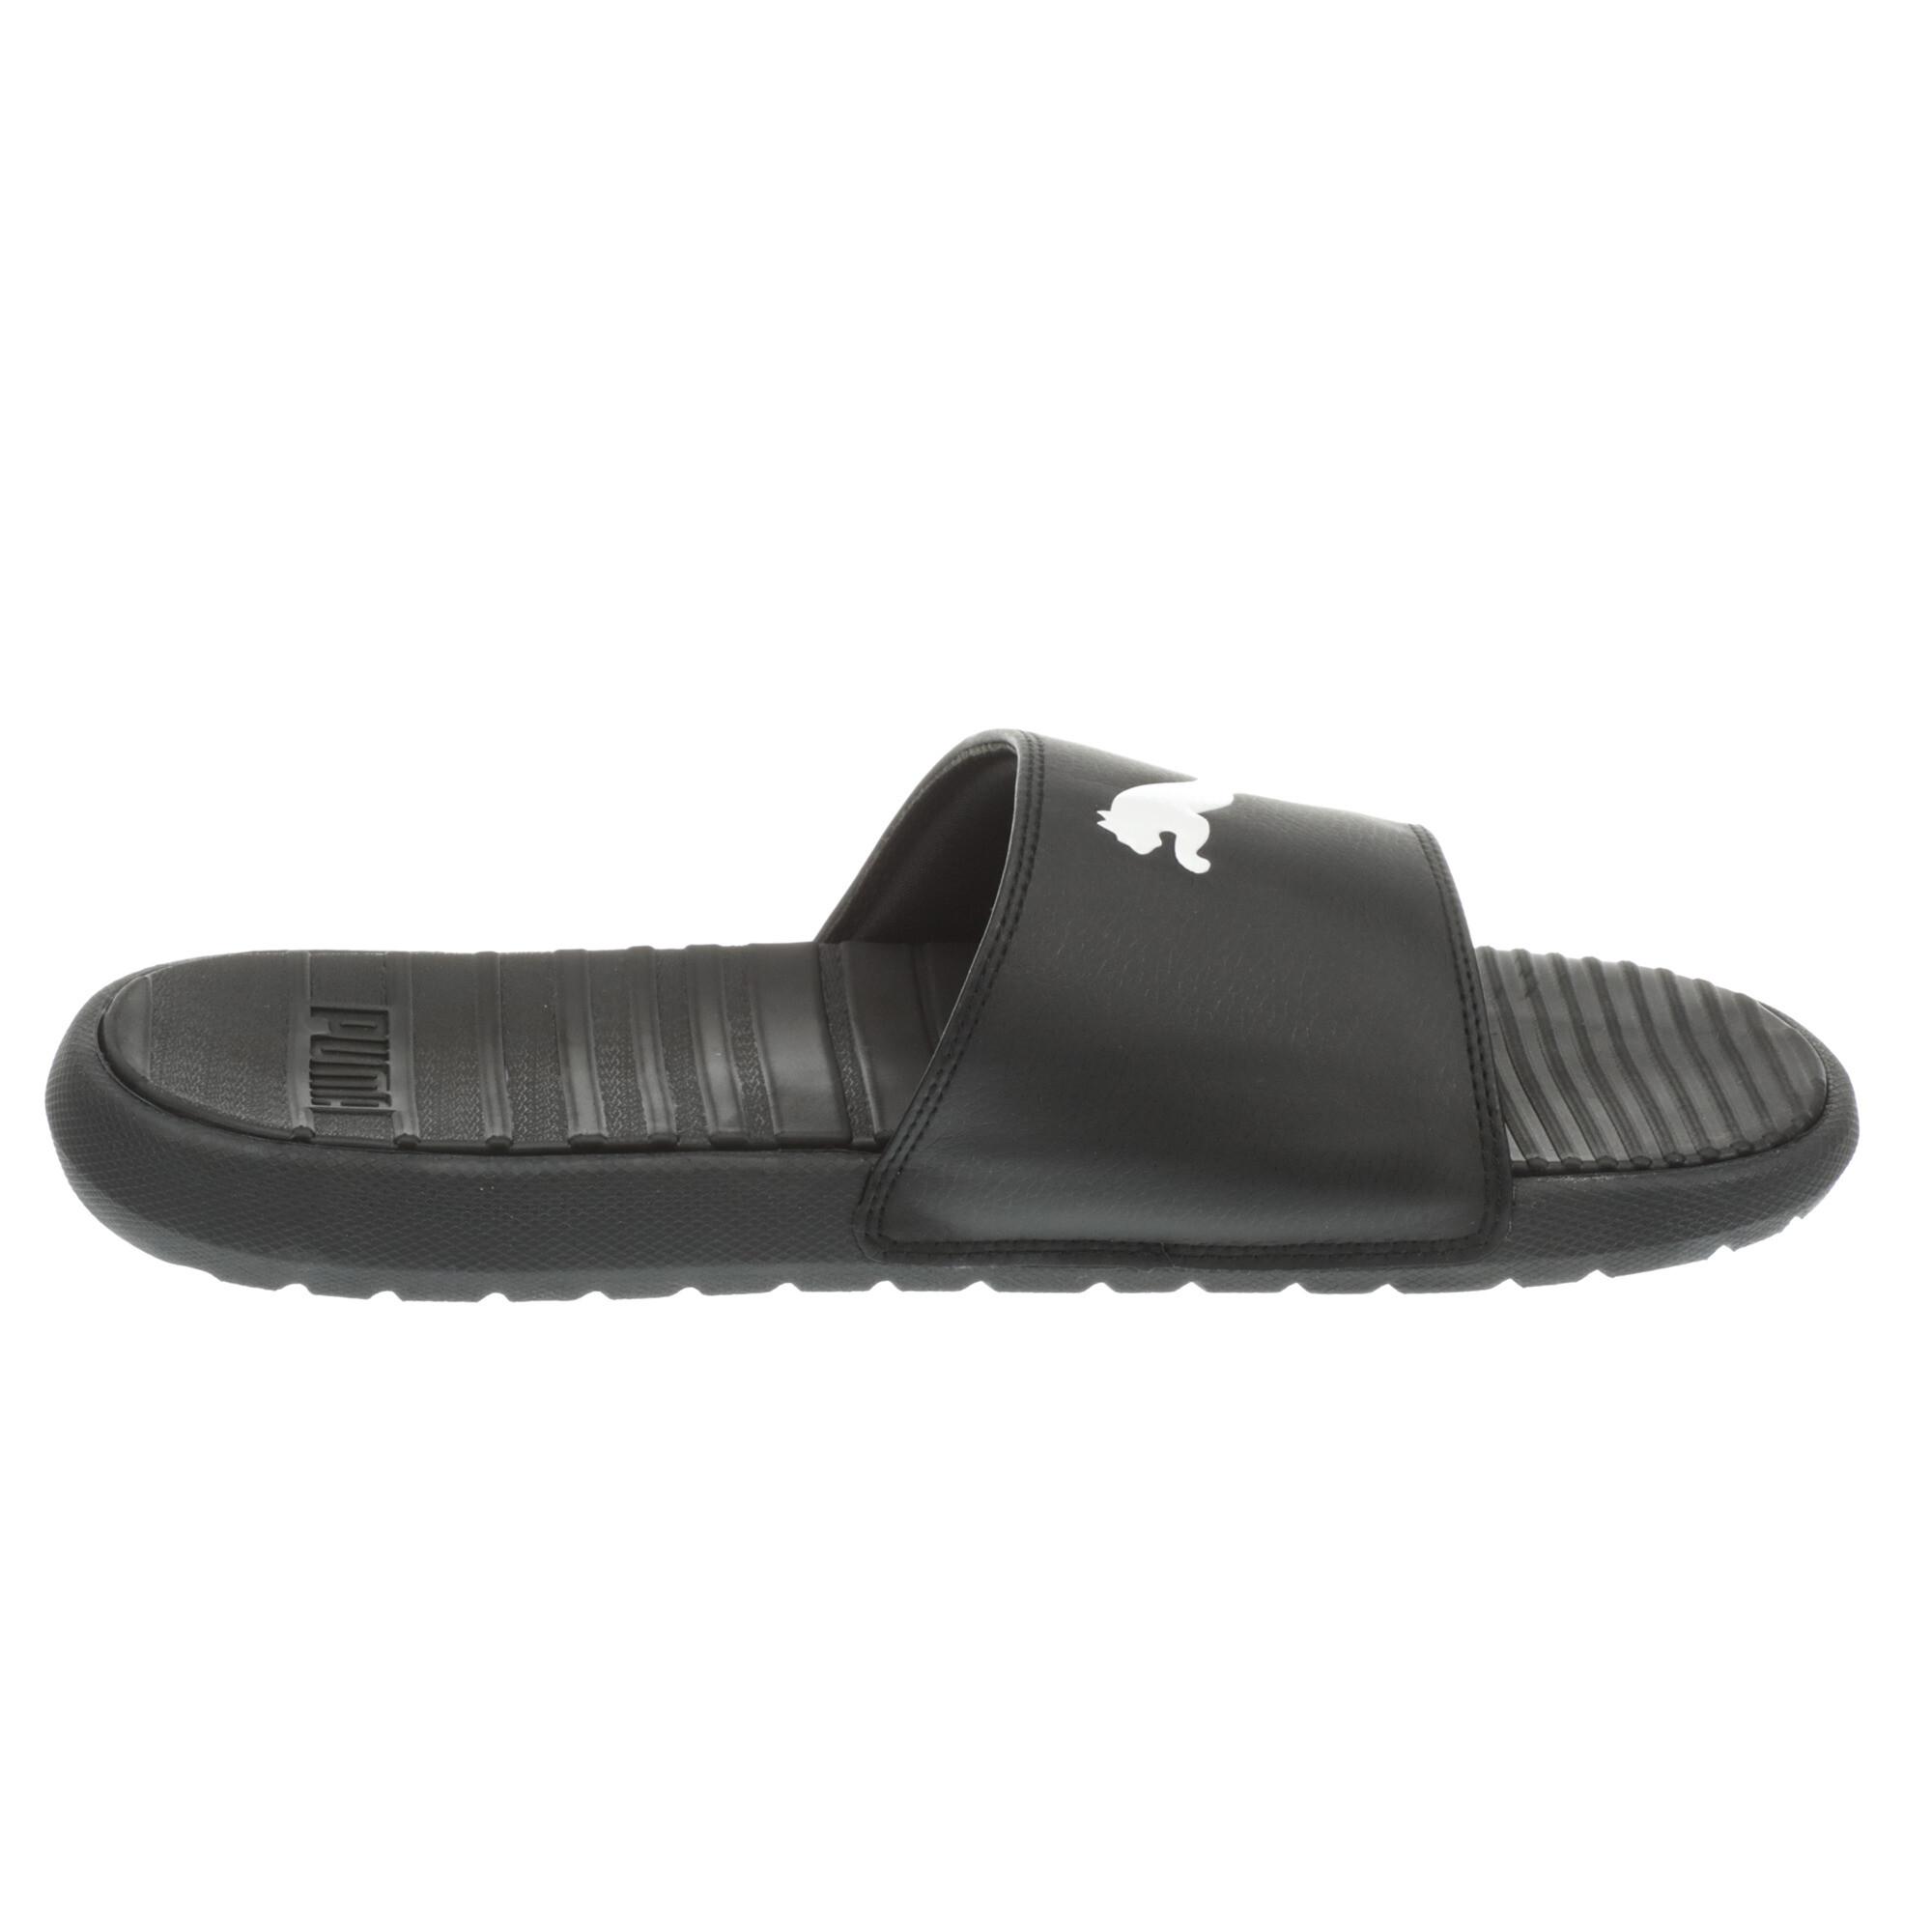 PUMA-Cool-Cat-Sport-Men-039-s-Slides-Men-Sandal-Swimming-Beach thumbnail 5